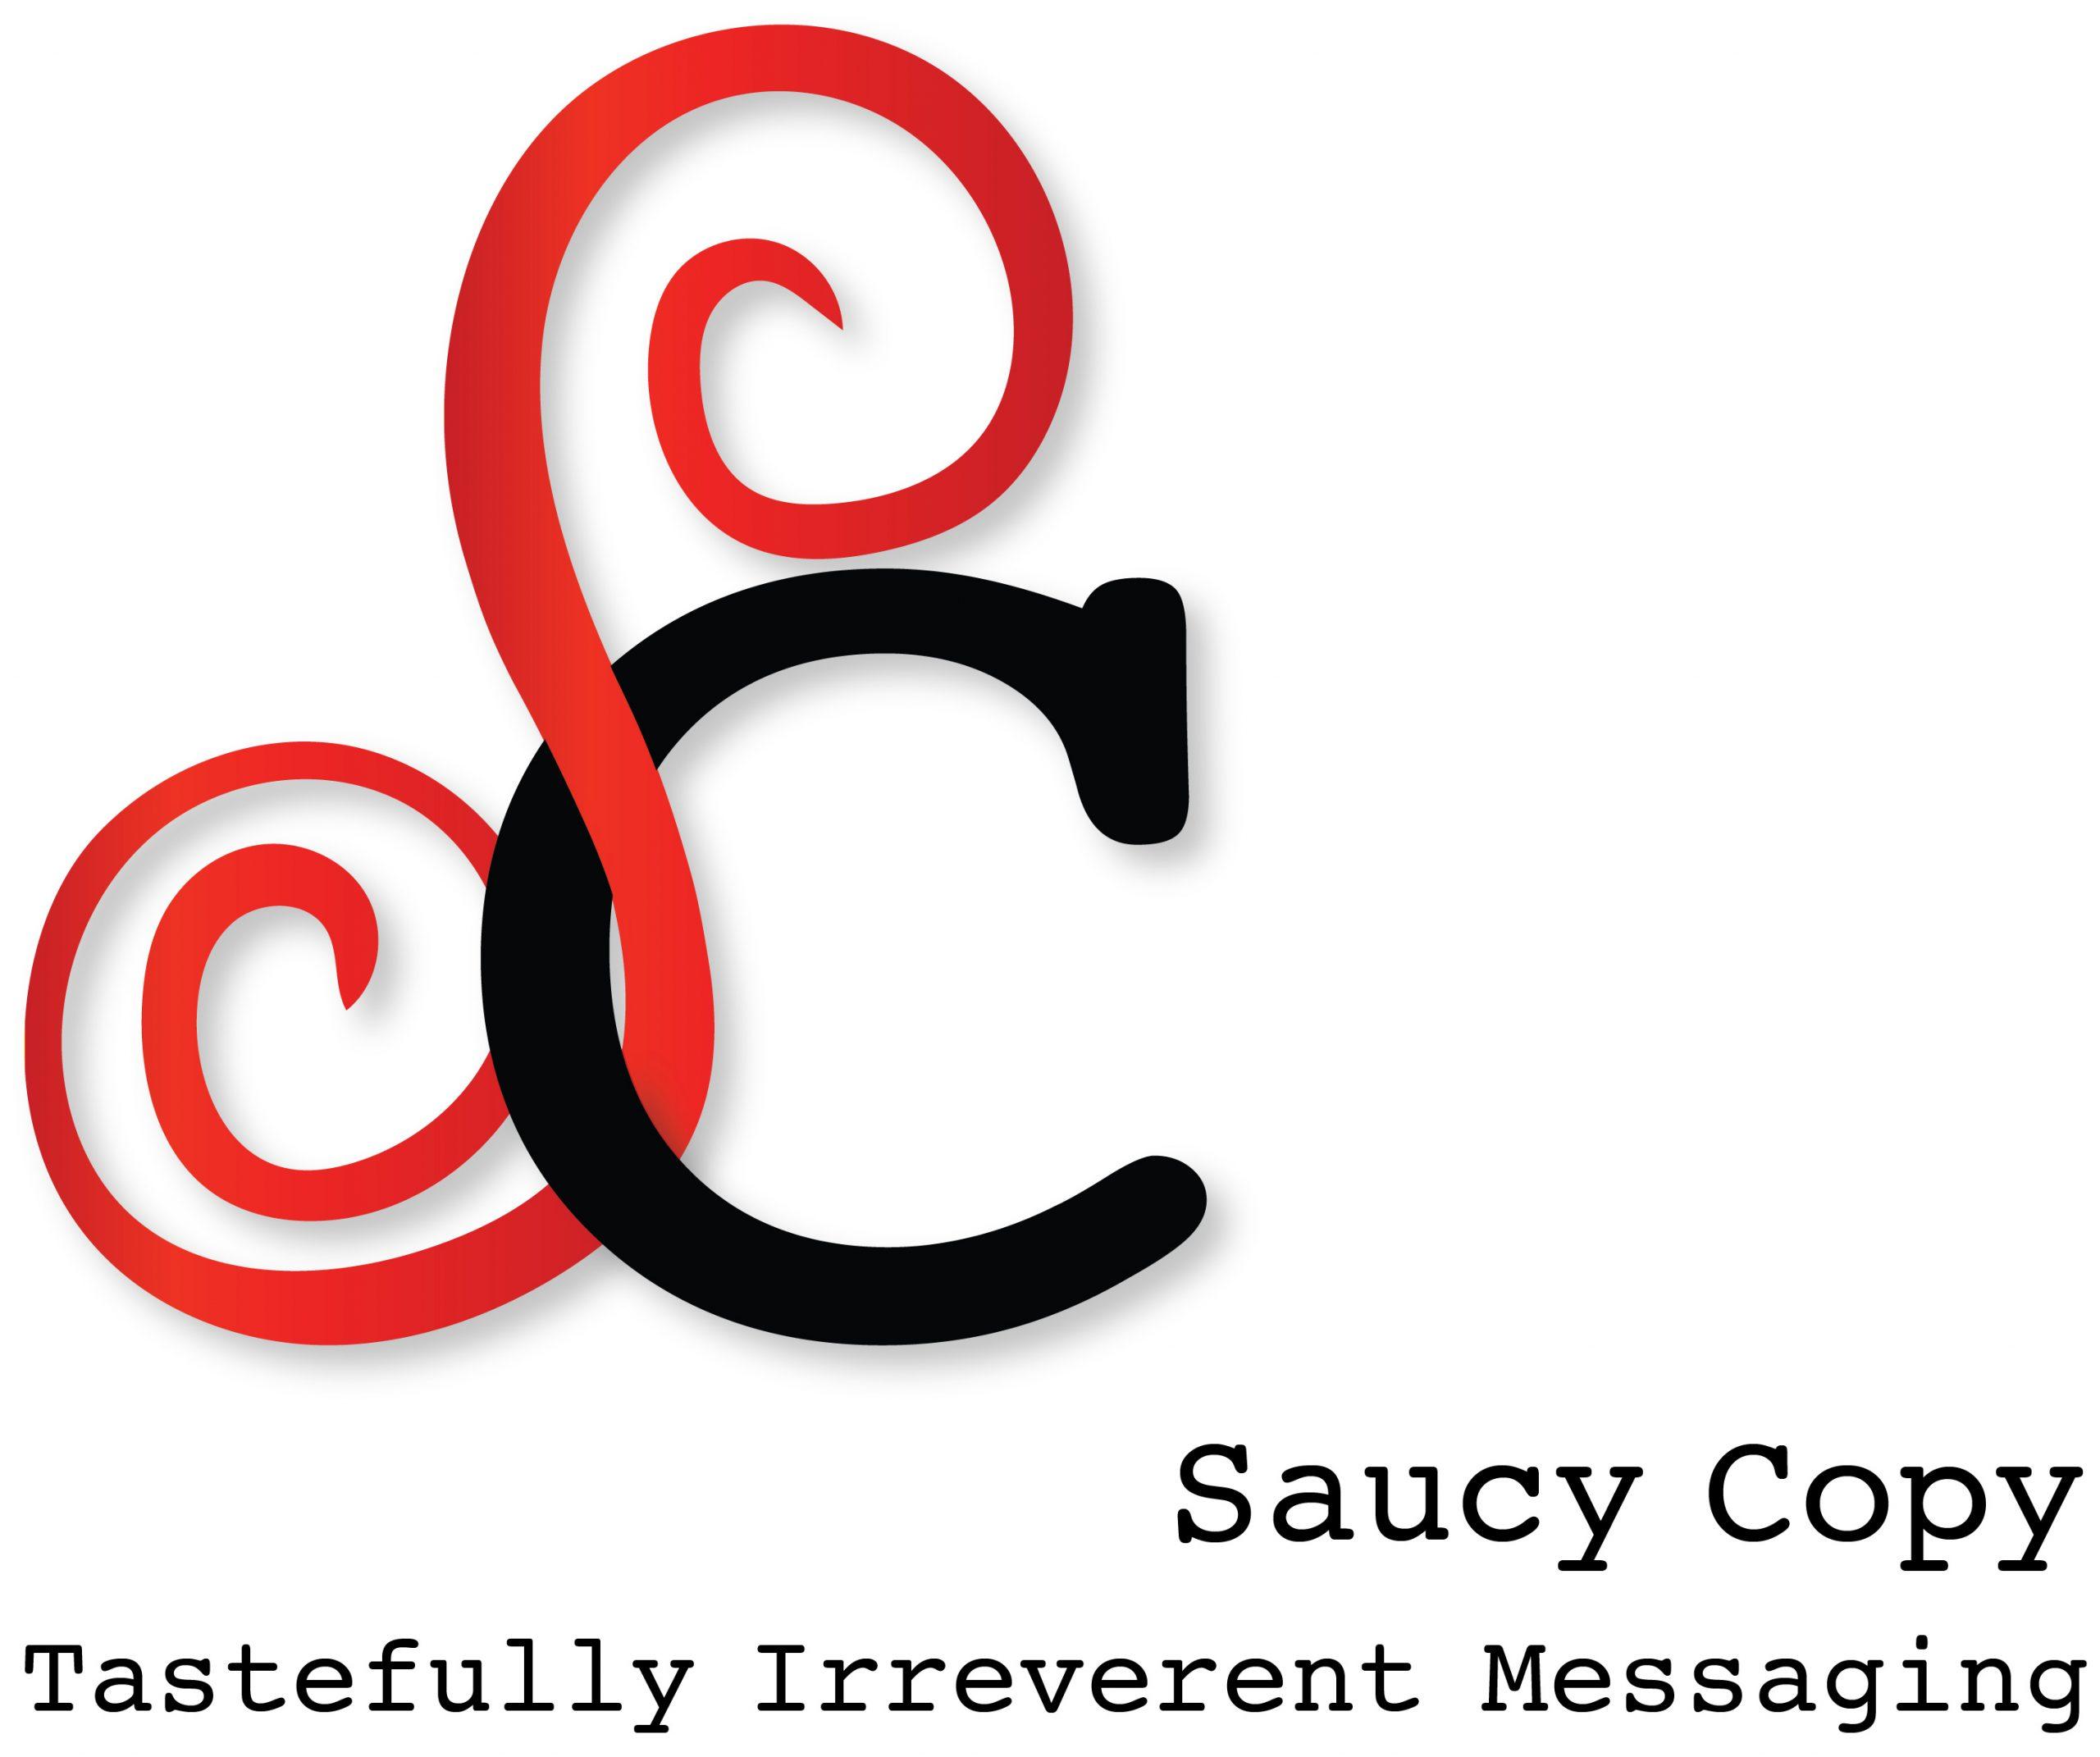 Saucy Copy